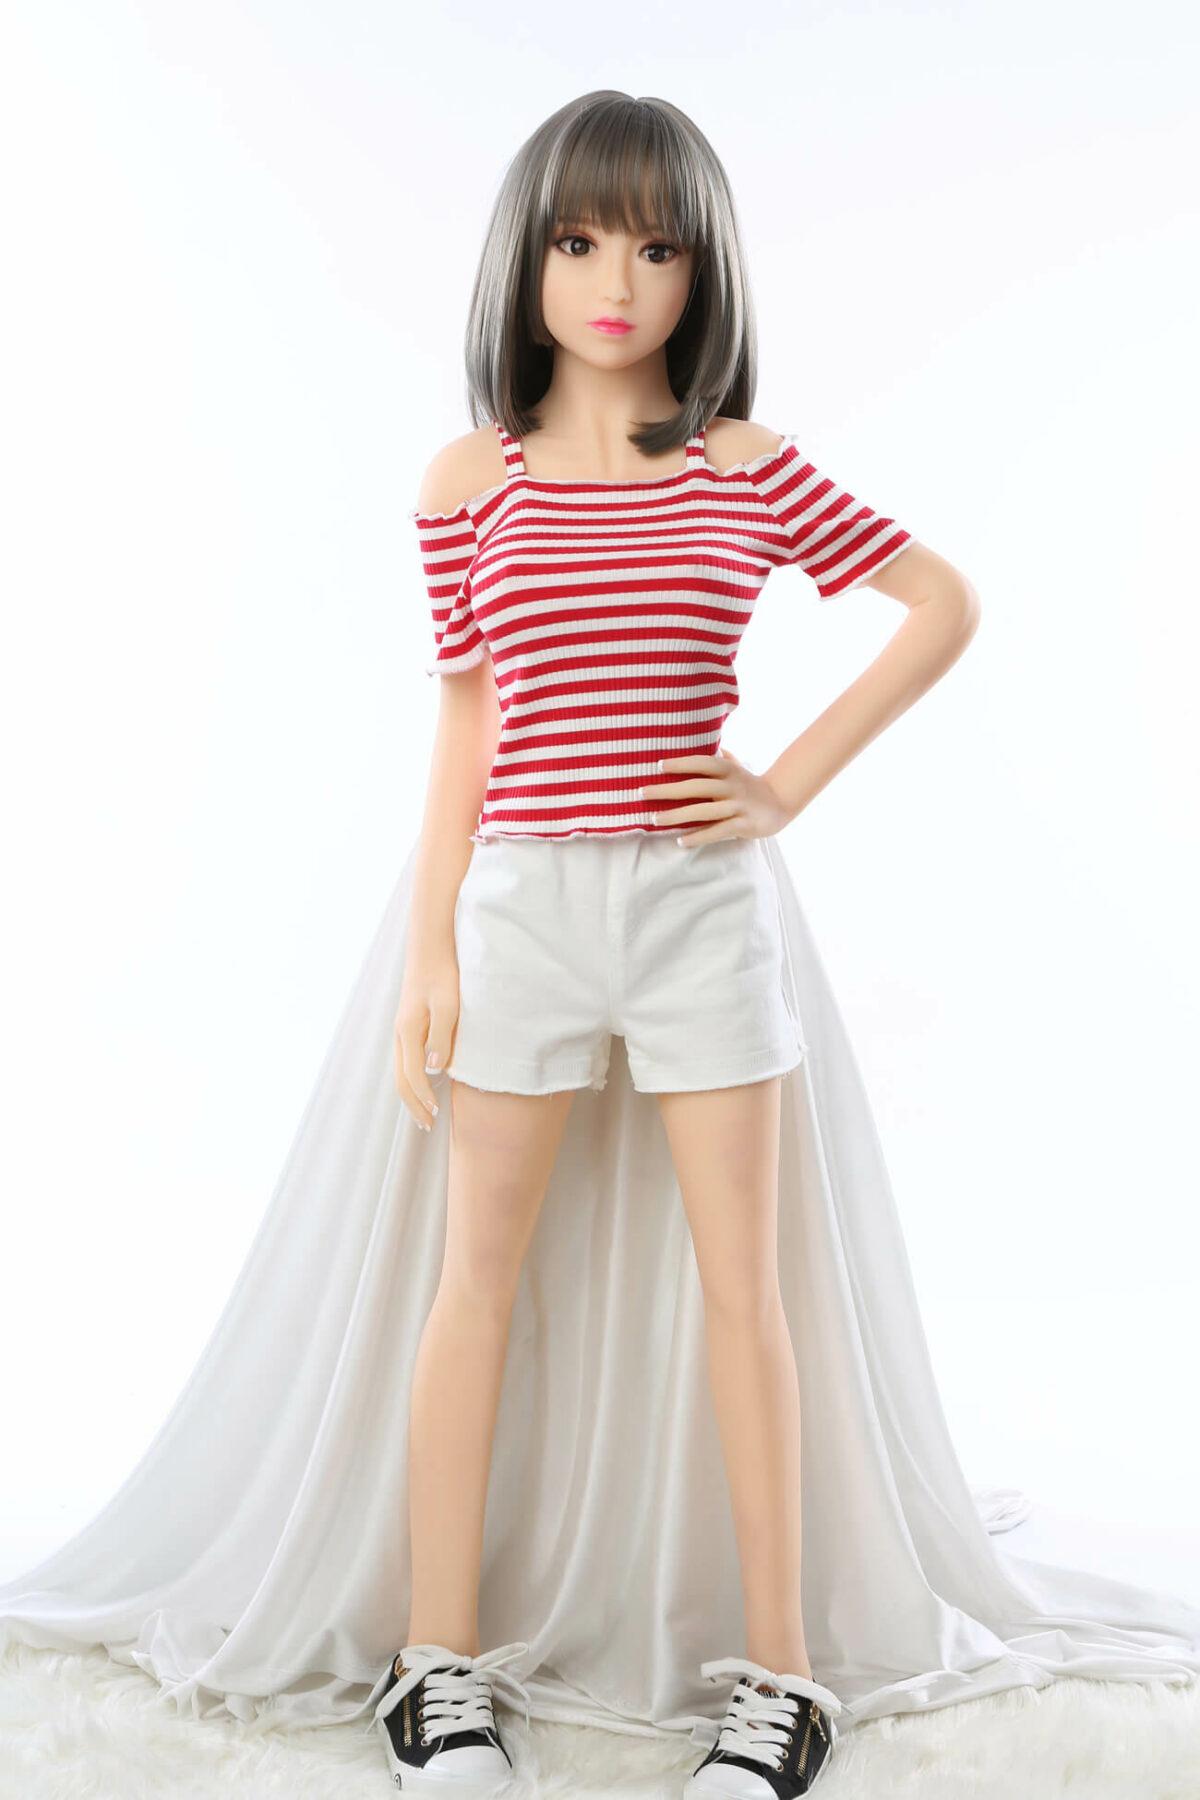 125cm Cheap Love Doll - Jasmine